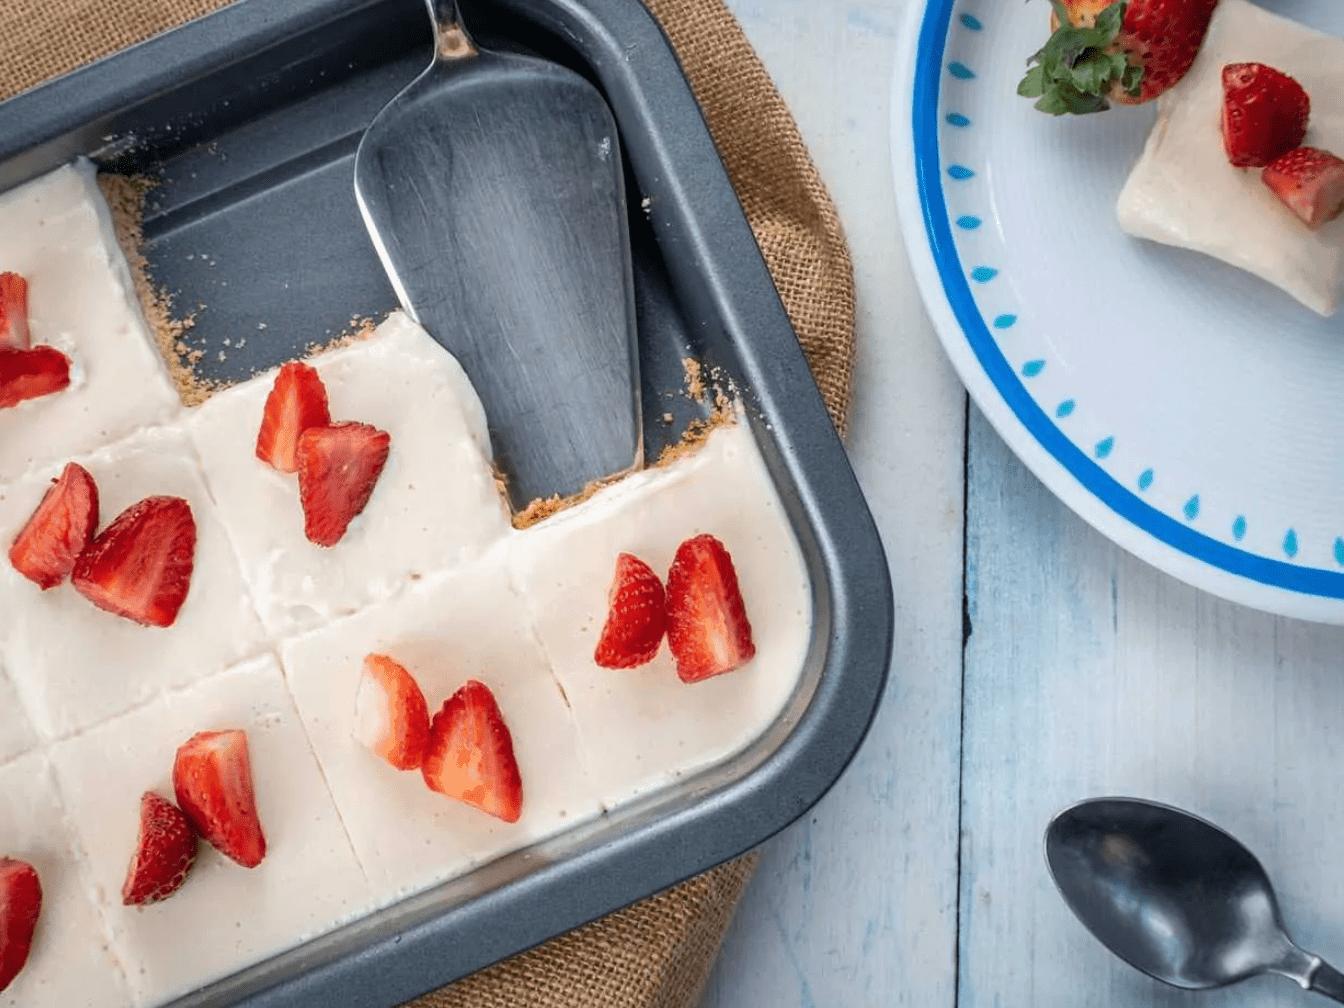 Strawberry Cream Pie Squares are Keto Friendly Desserts